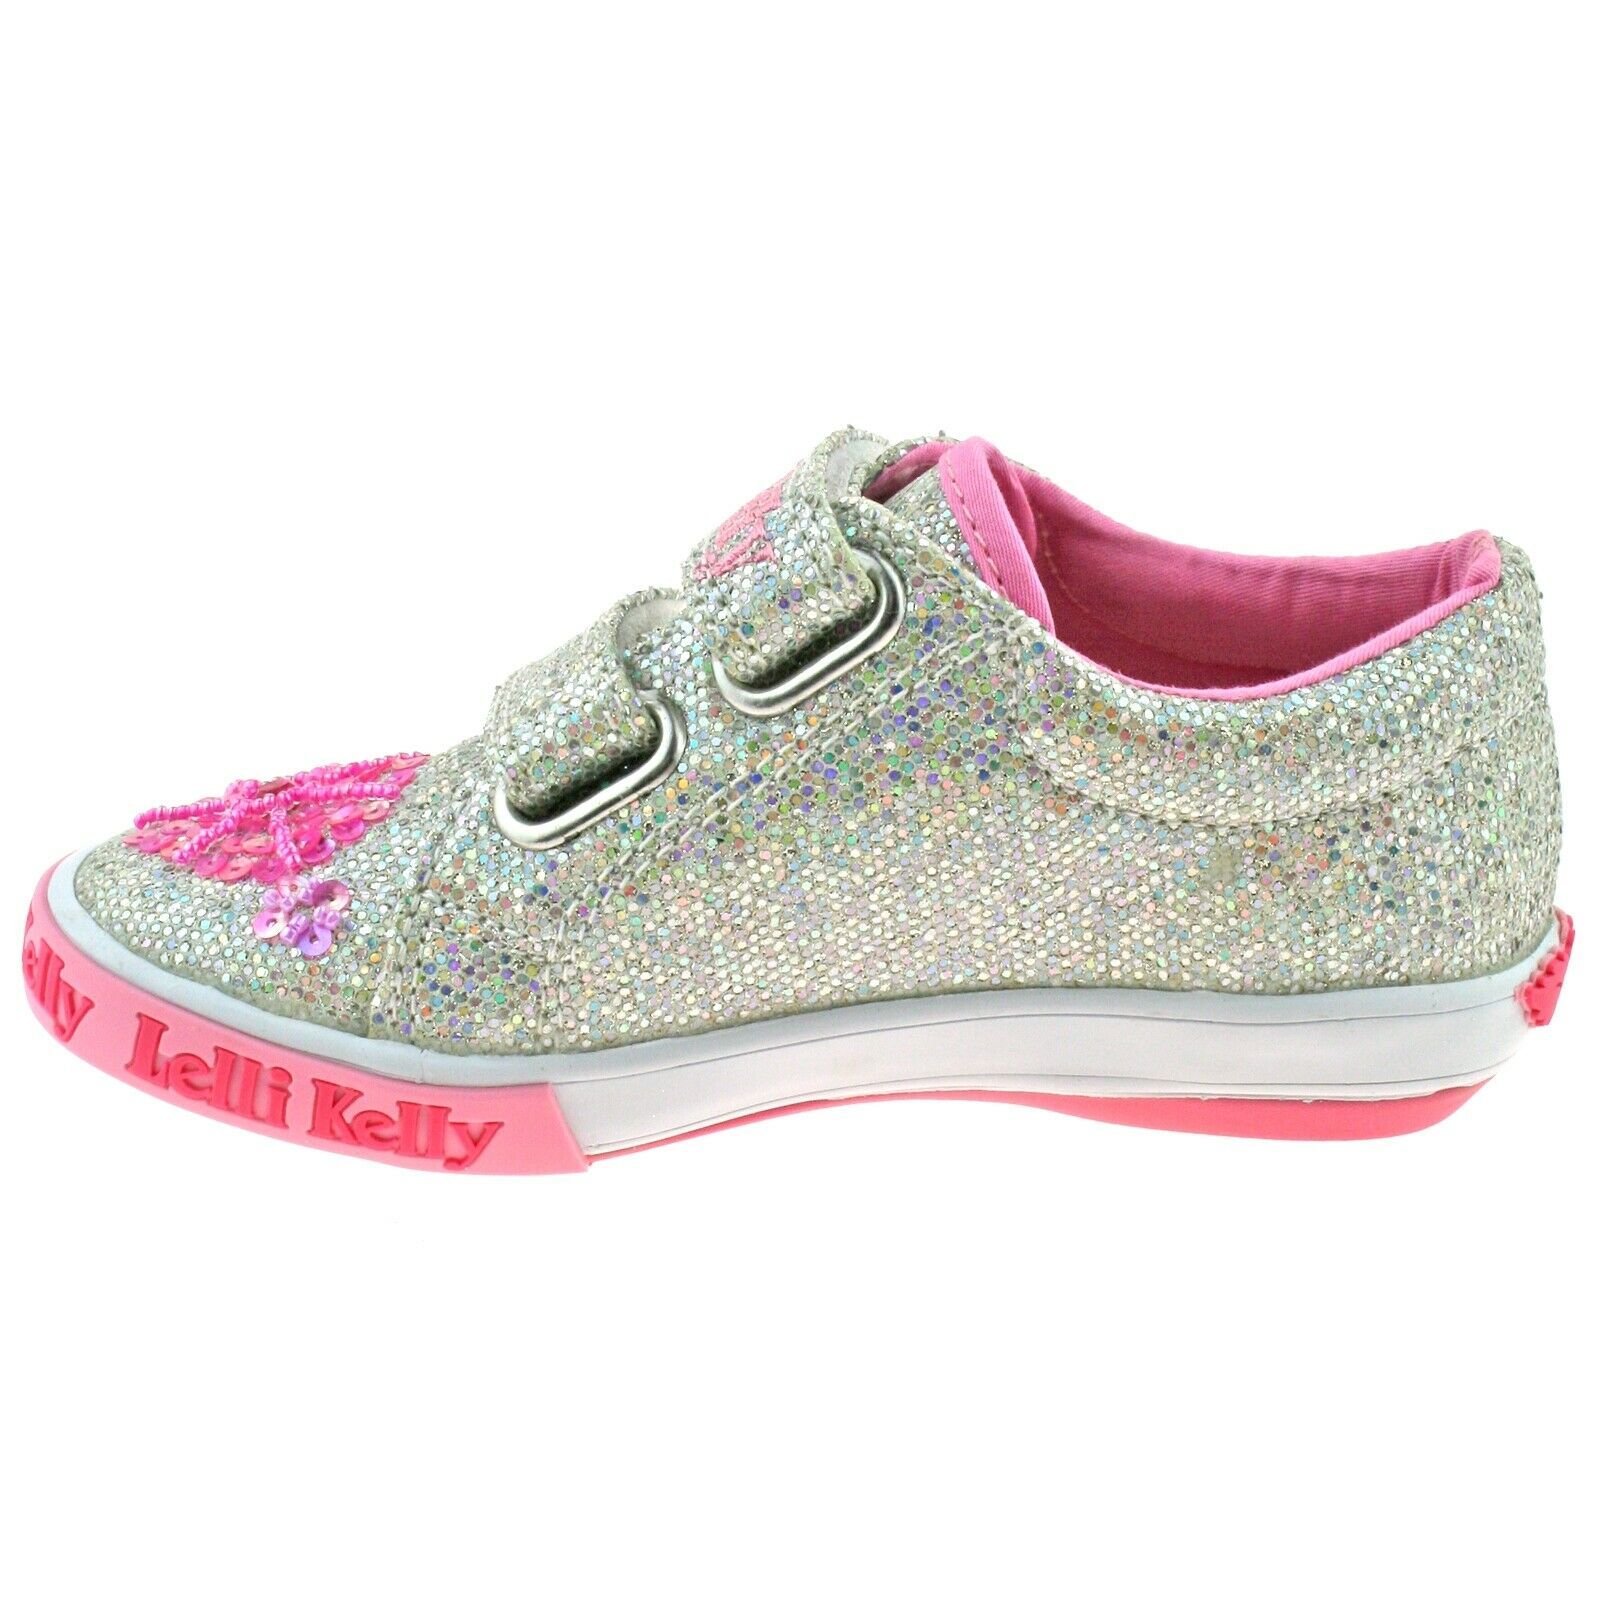 Lelli Kelly LK9081 GH01 Silver Glitter Daisy Adjustable Double Strap Shoes